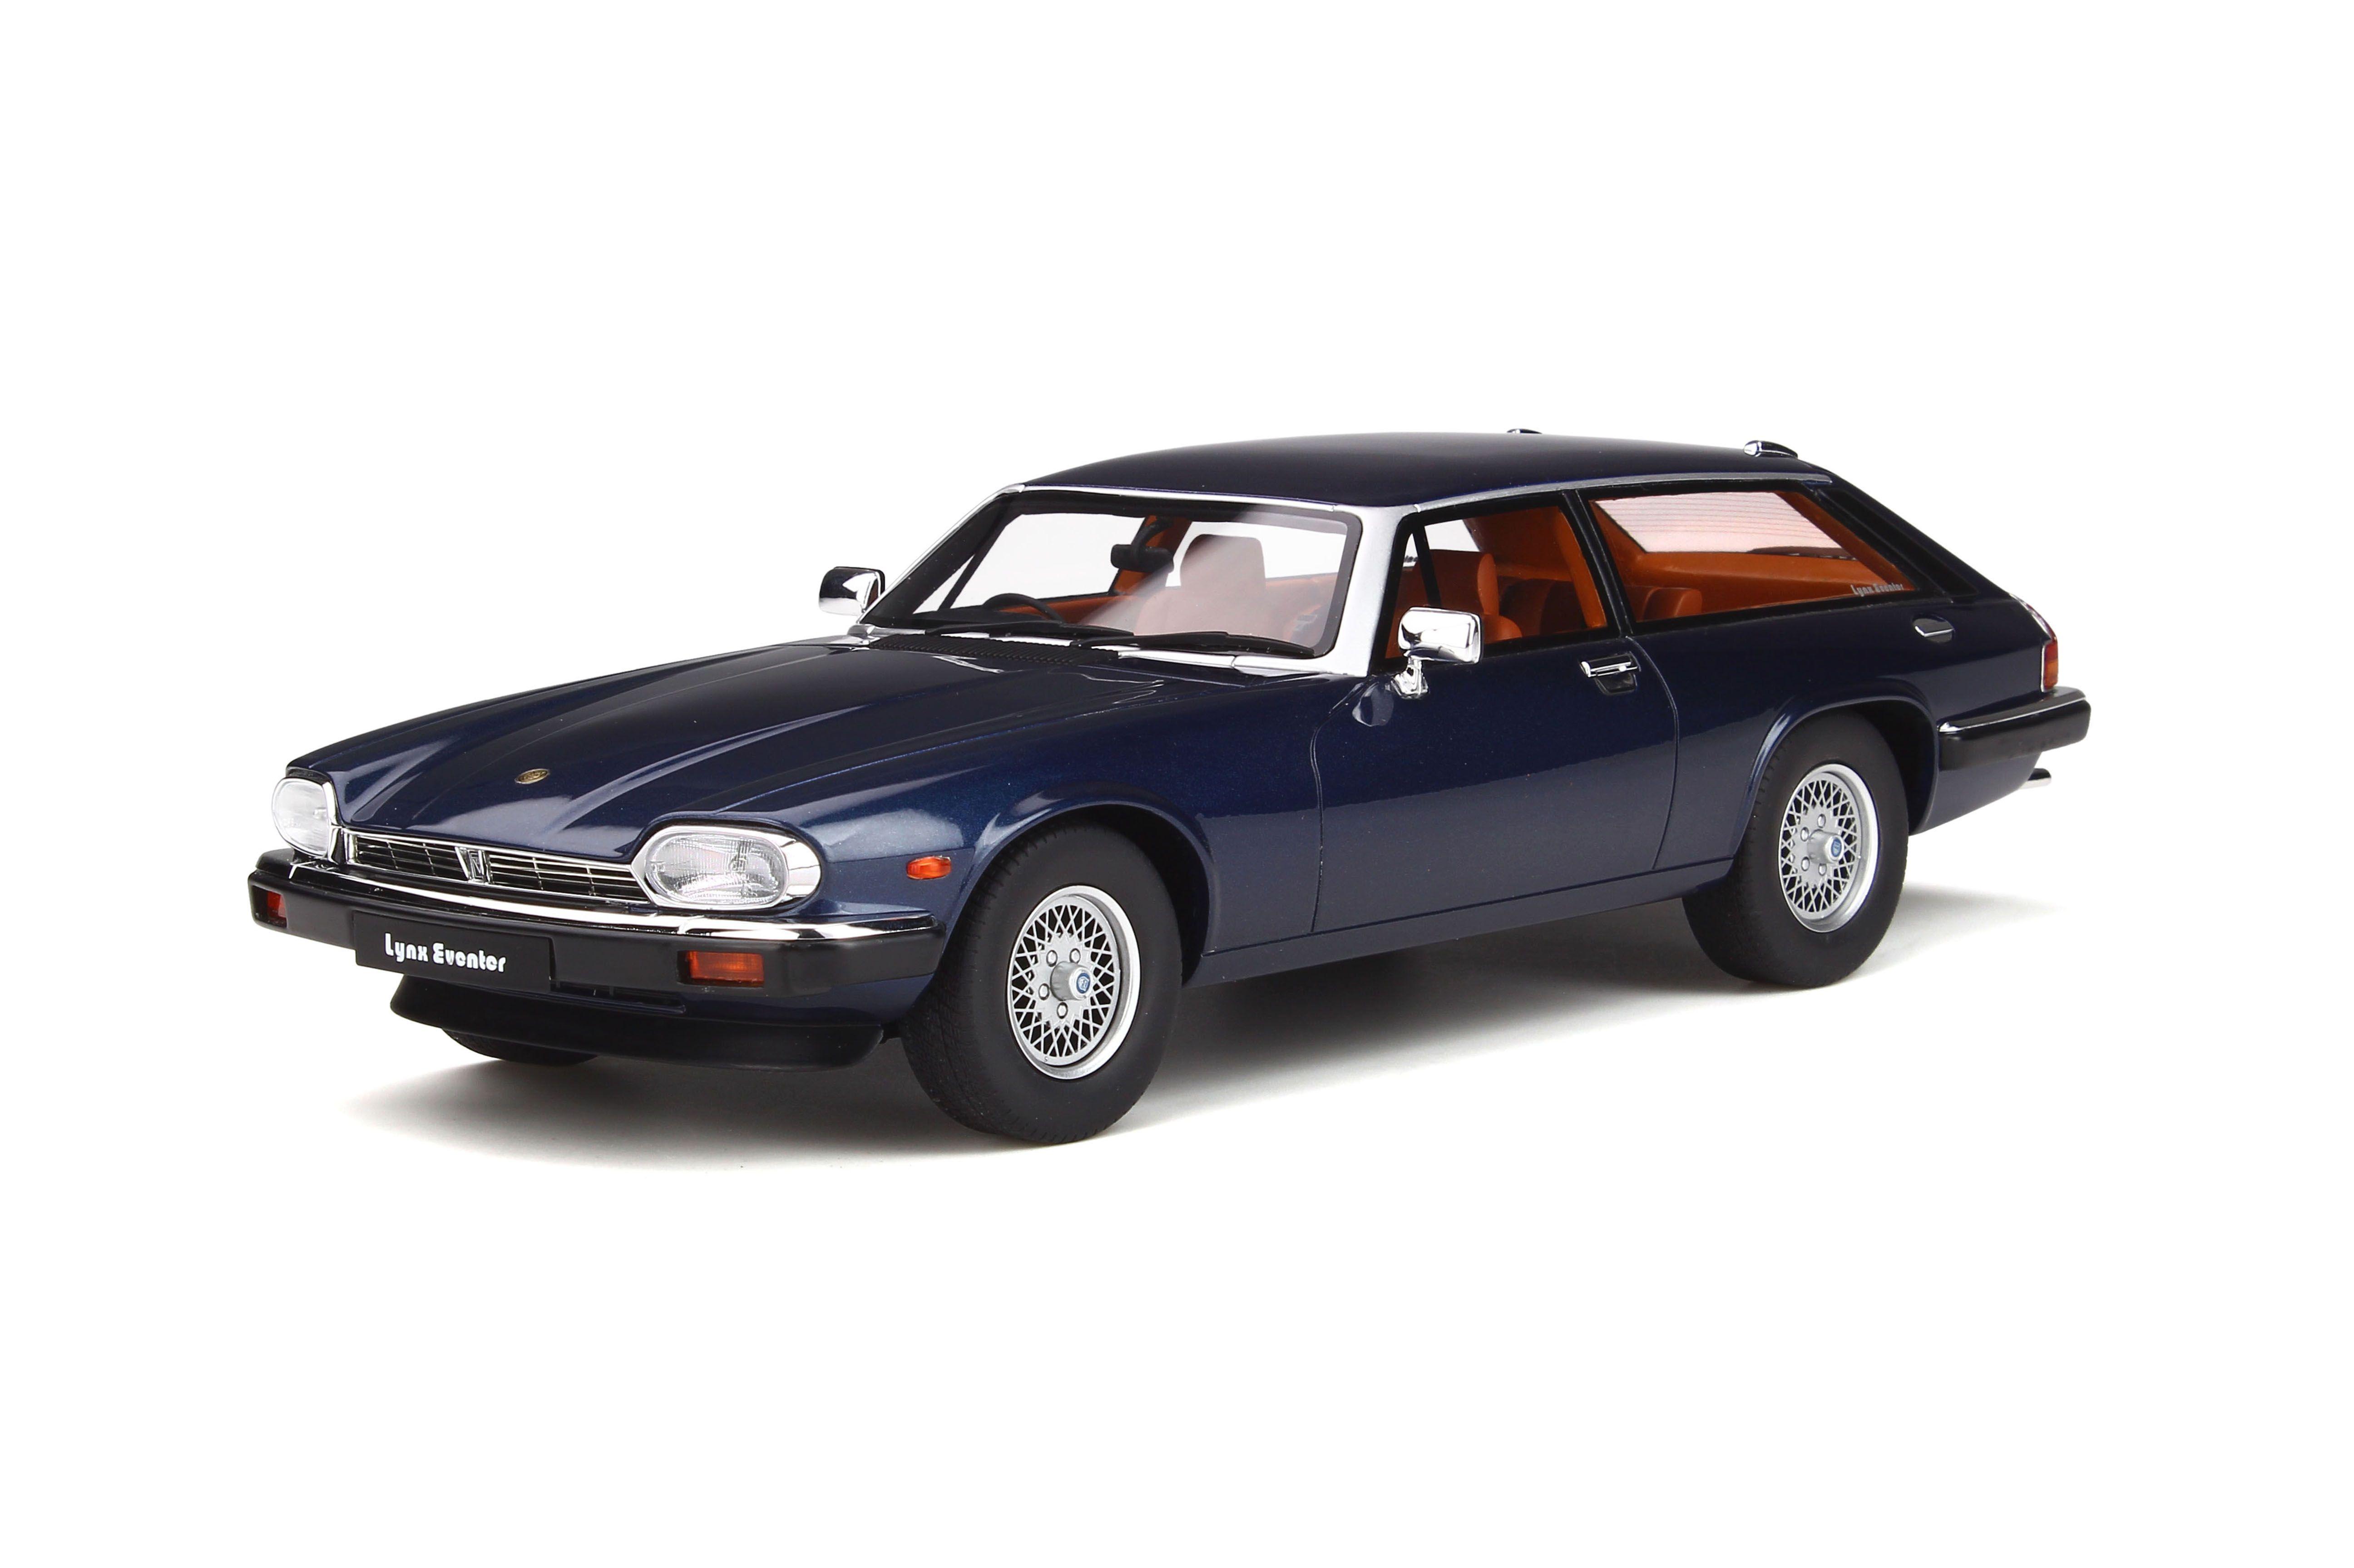 Modellbau Jaguar ~ Modellbau klar.de gt spirit 788 jaguar xjs lynx eventer 1983 blau